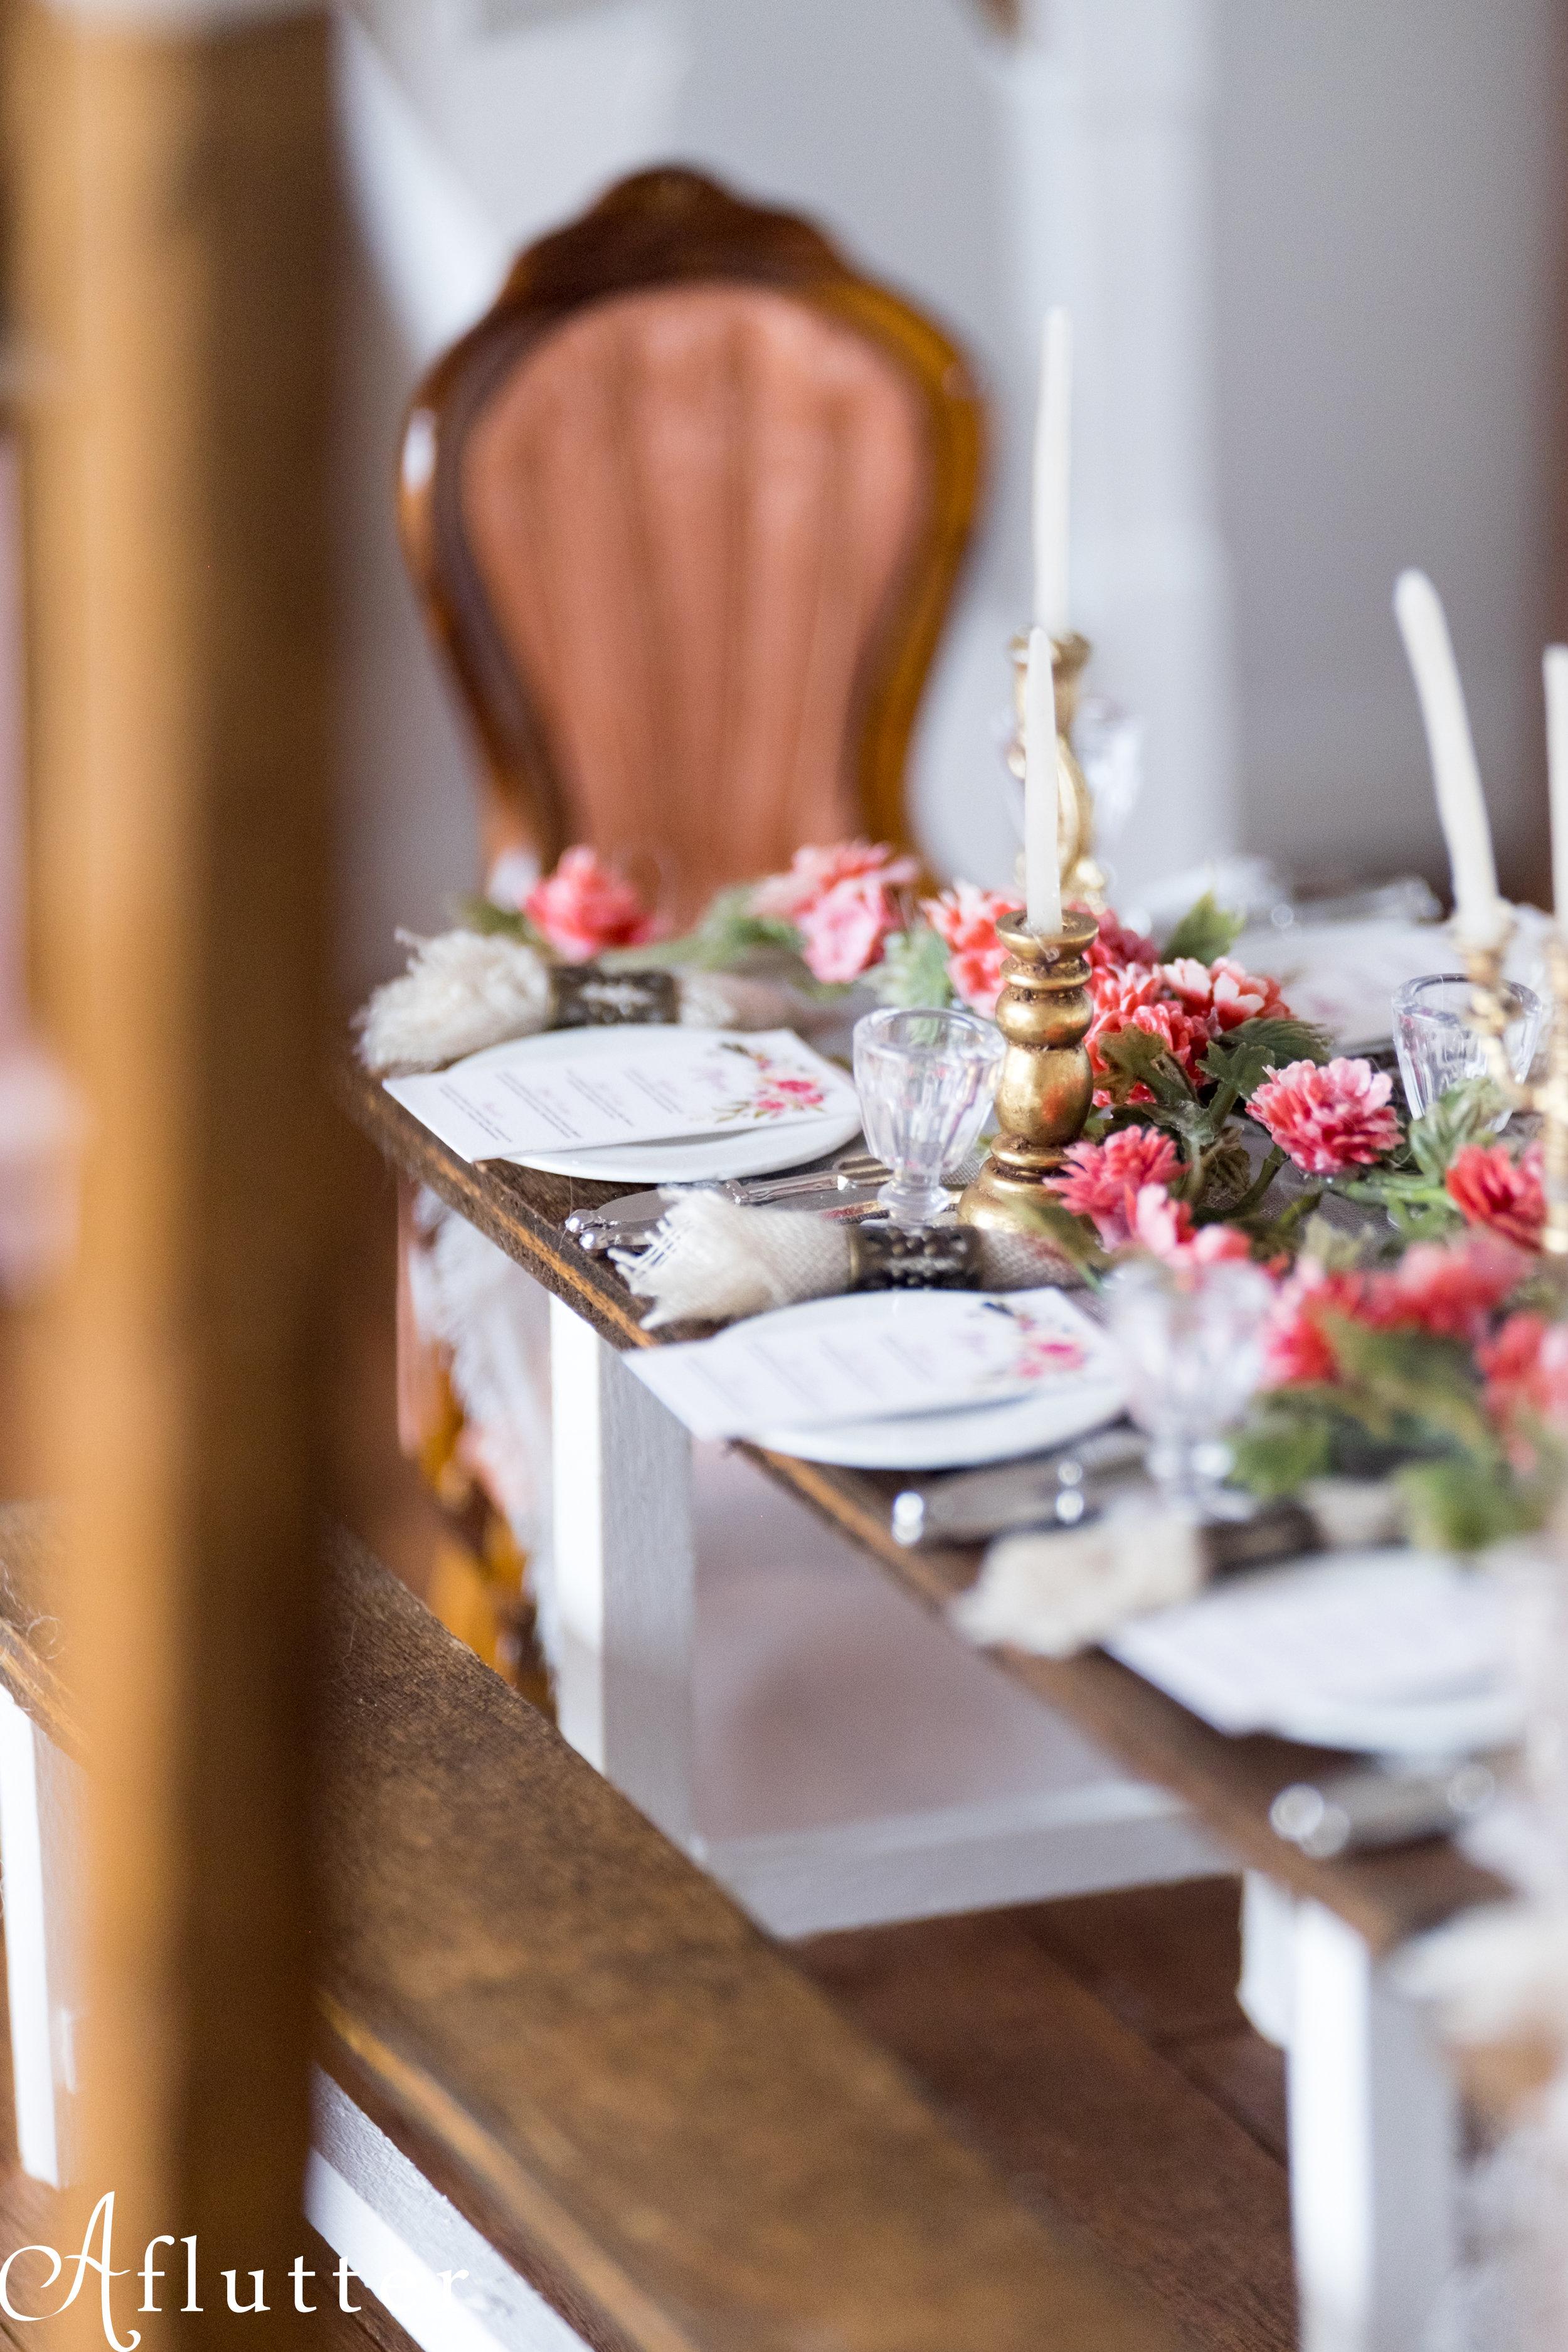 Brenul-Barn-Mini-Wedding-3-of-16.jpg